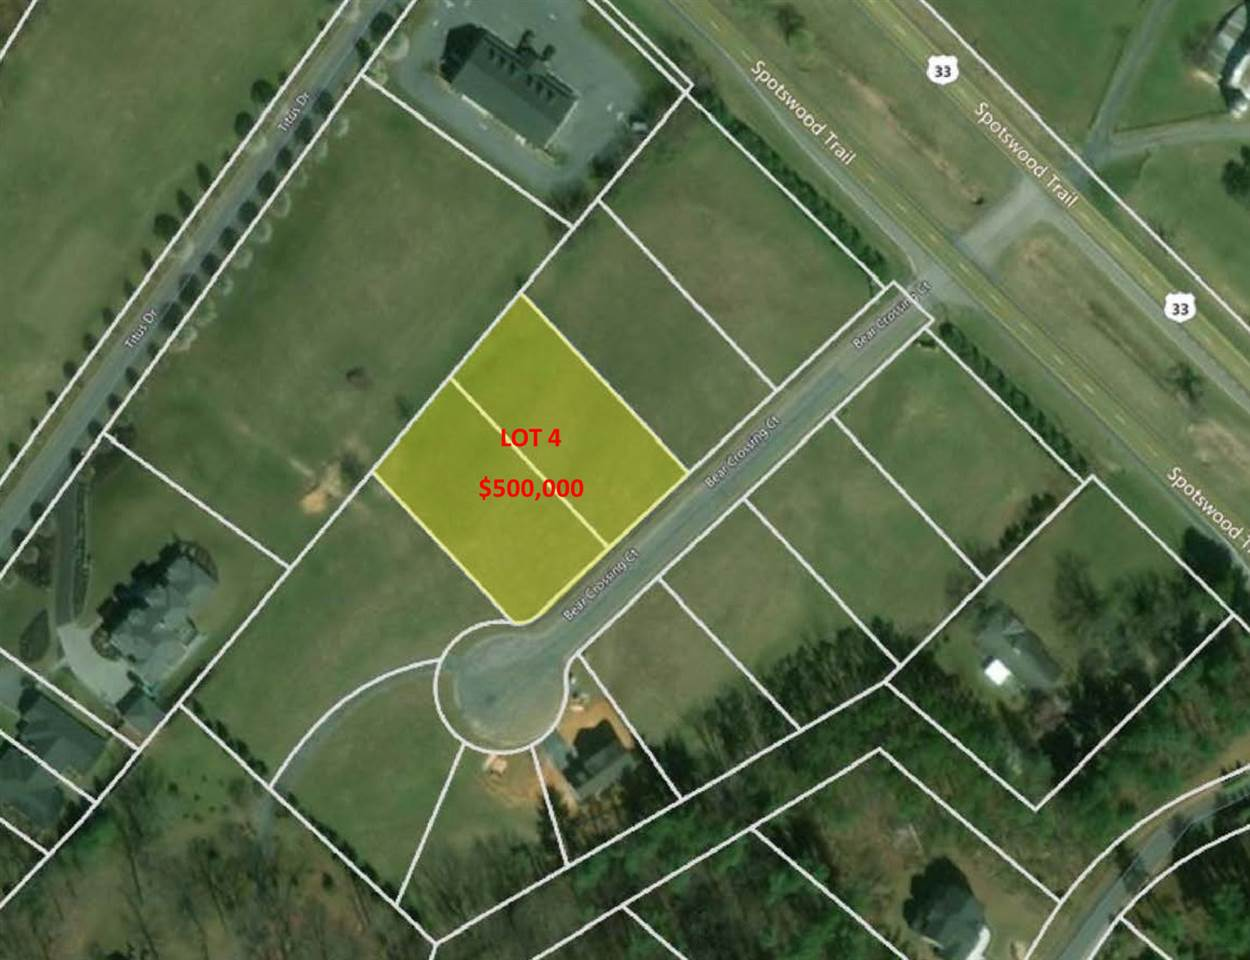 Lot 9-10 BEAR CROSSING CT, PENN LAIRD, VA 22846